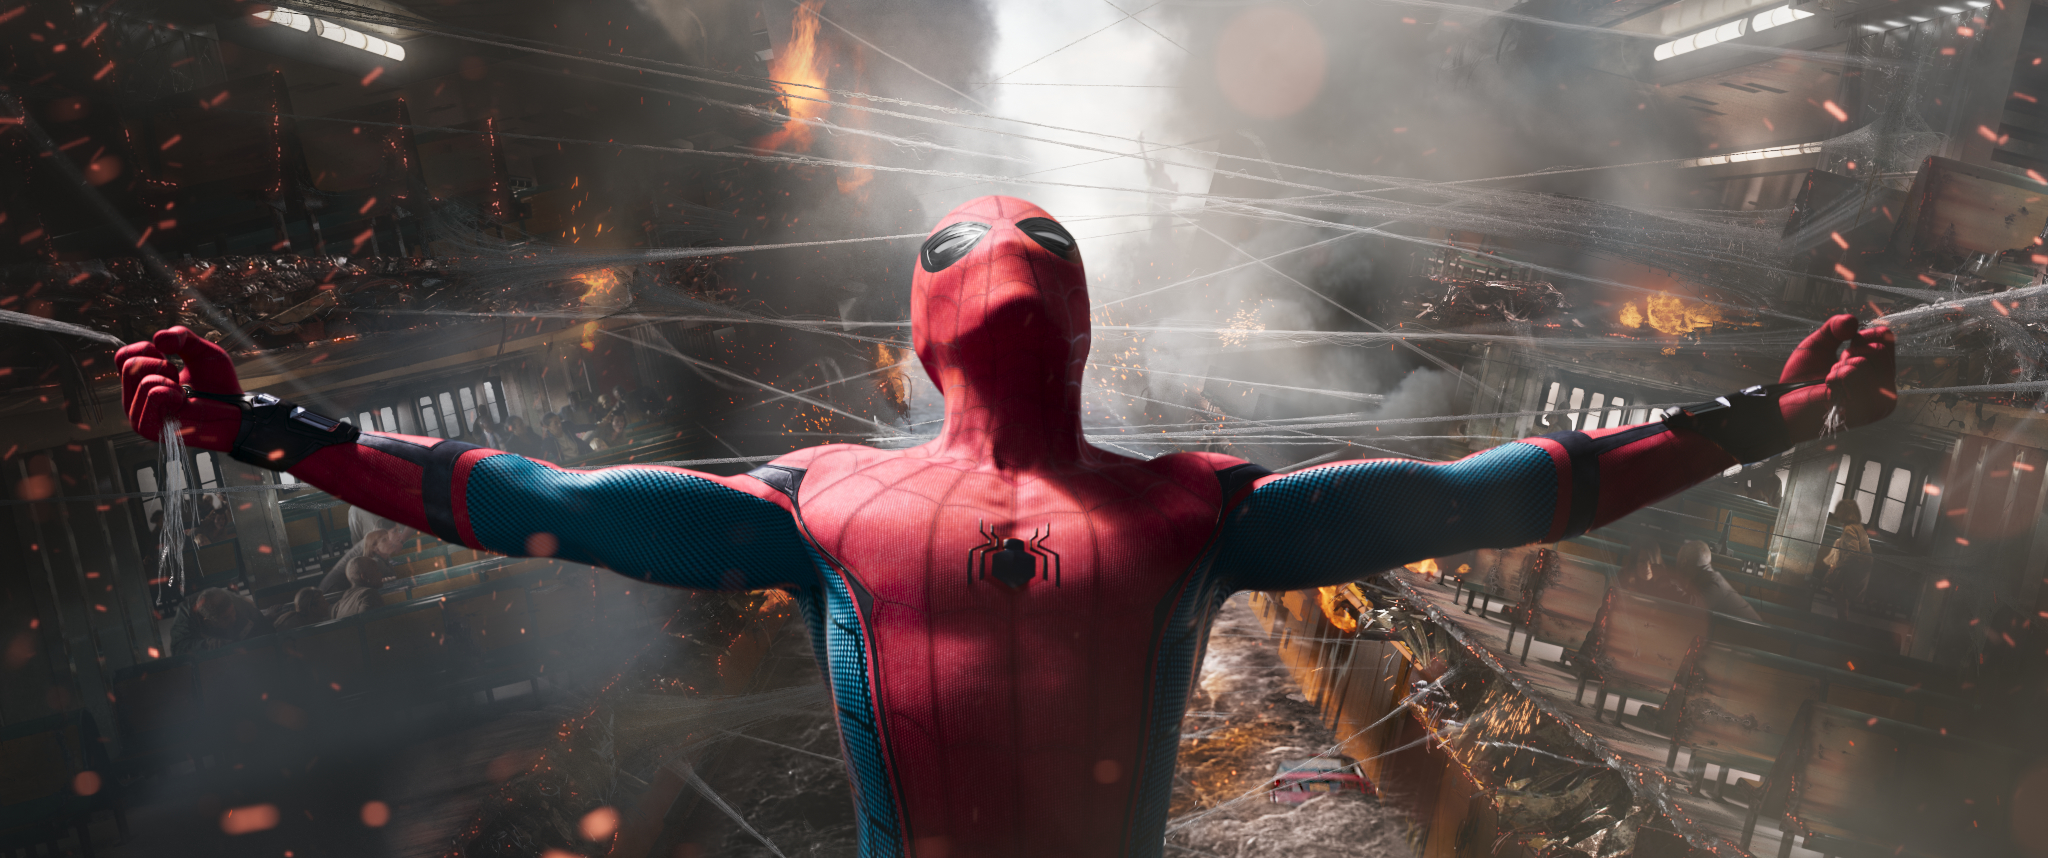 Spider Man Homecoming 4K UHD Blu-ray Review Szene 1